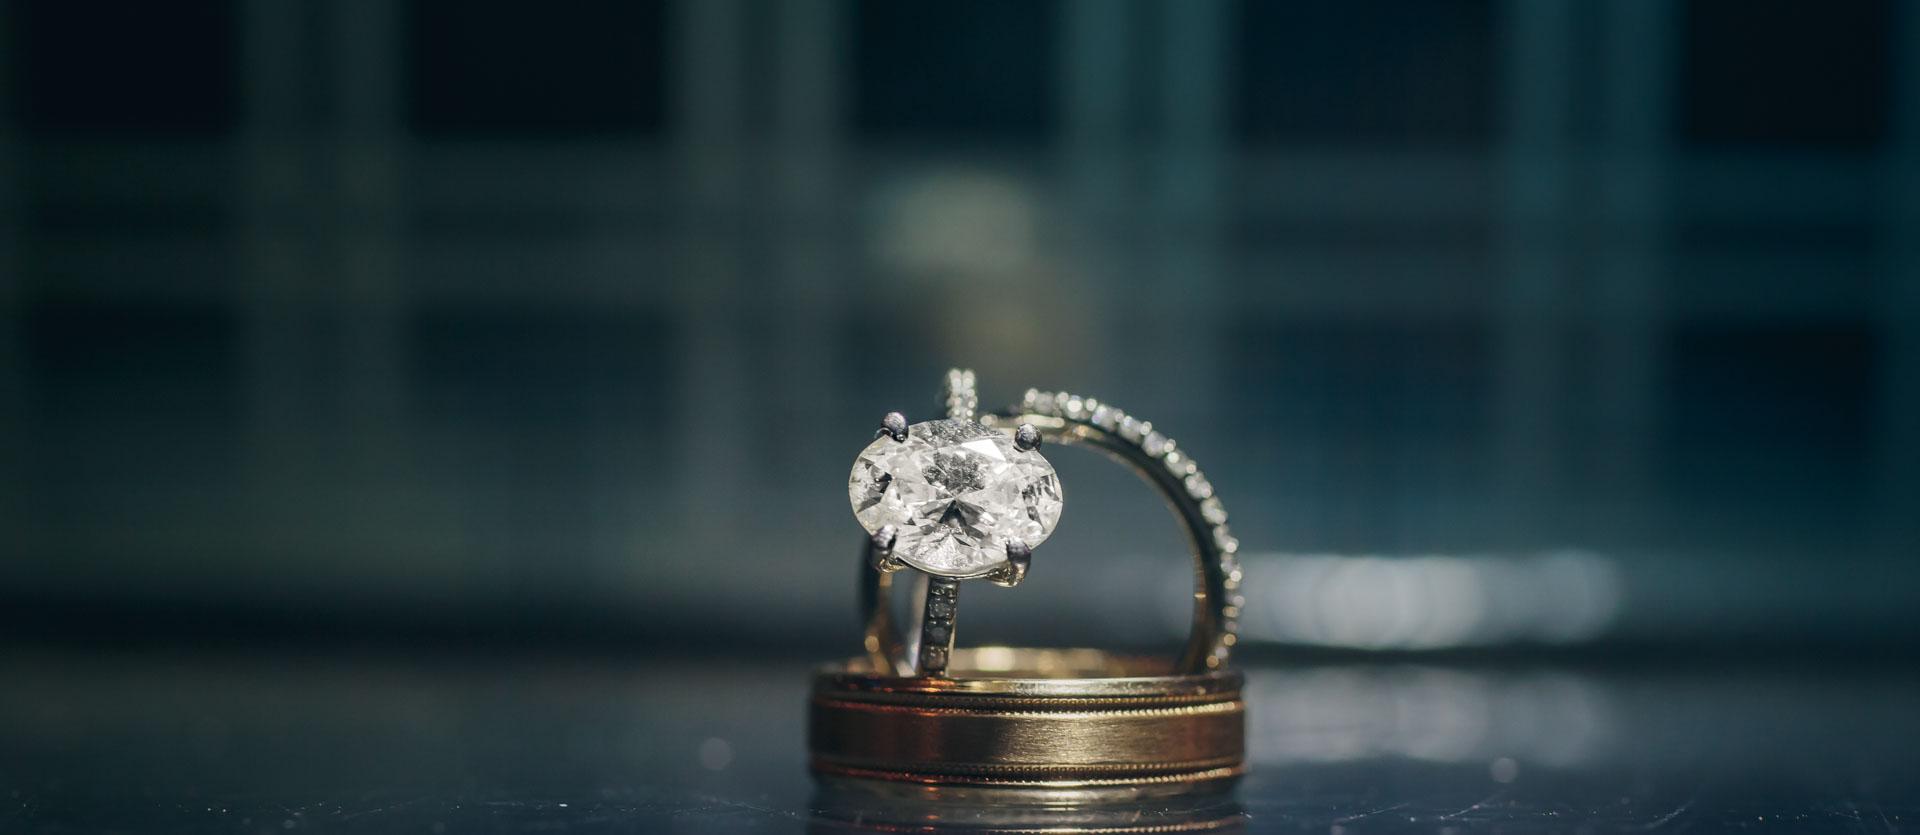 yost-rings